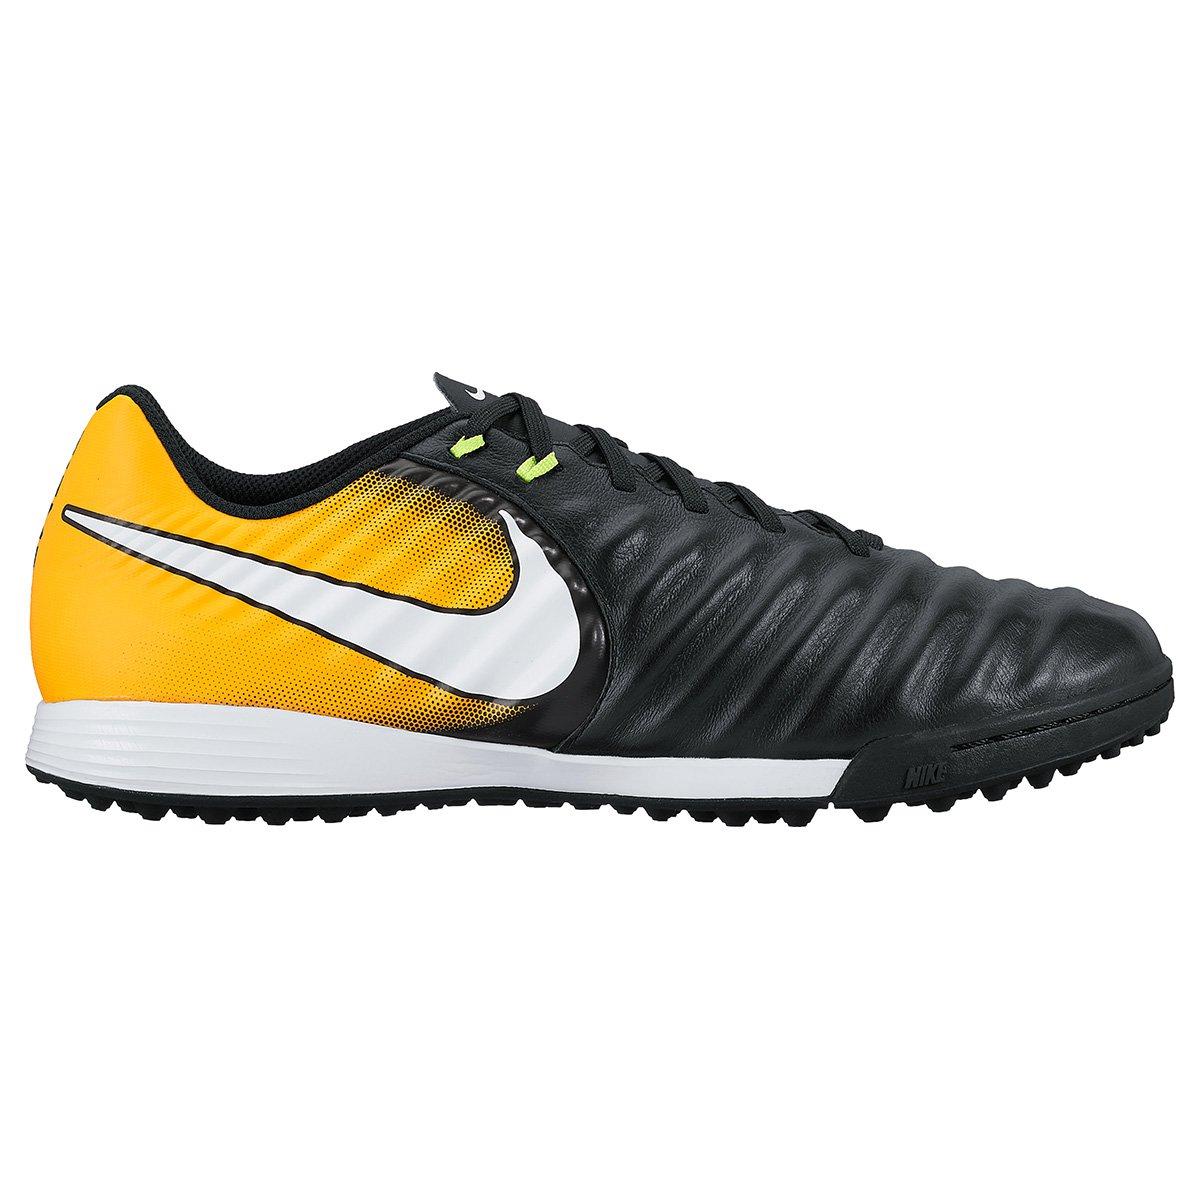 ace9a3aee94c1 Chuteira Society Nike Tiempo Ligera 4 TF